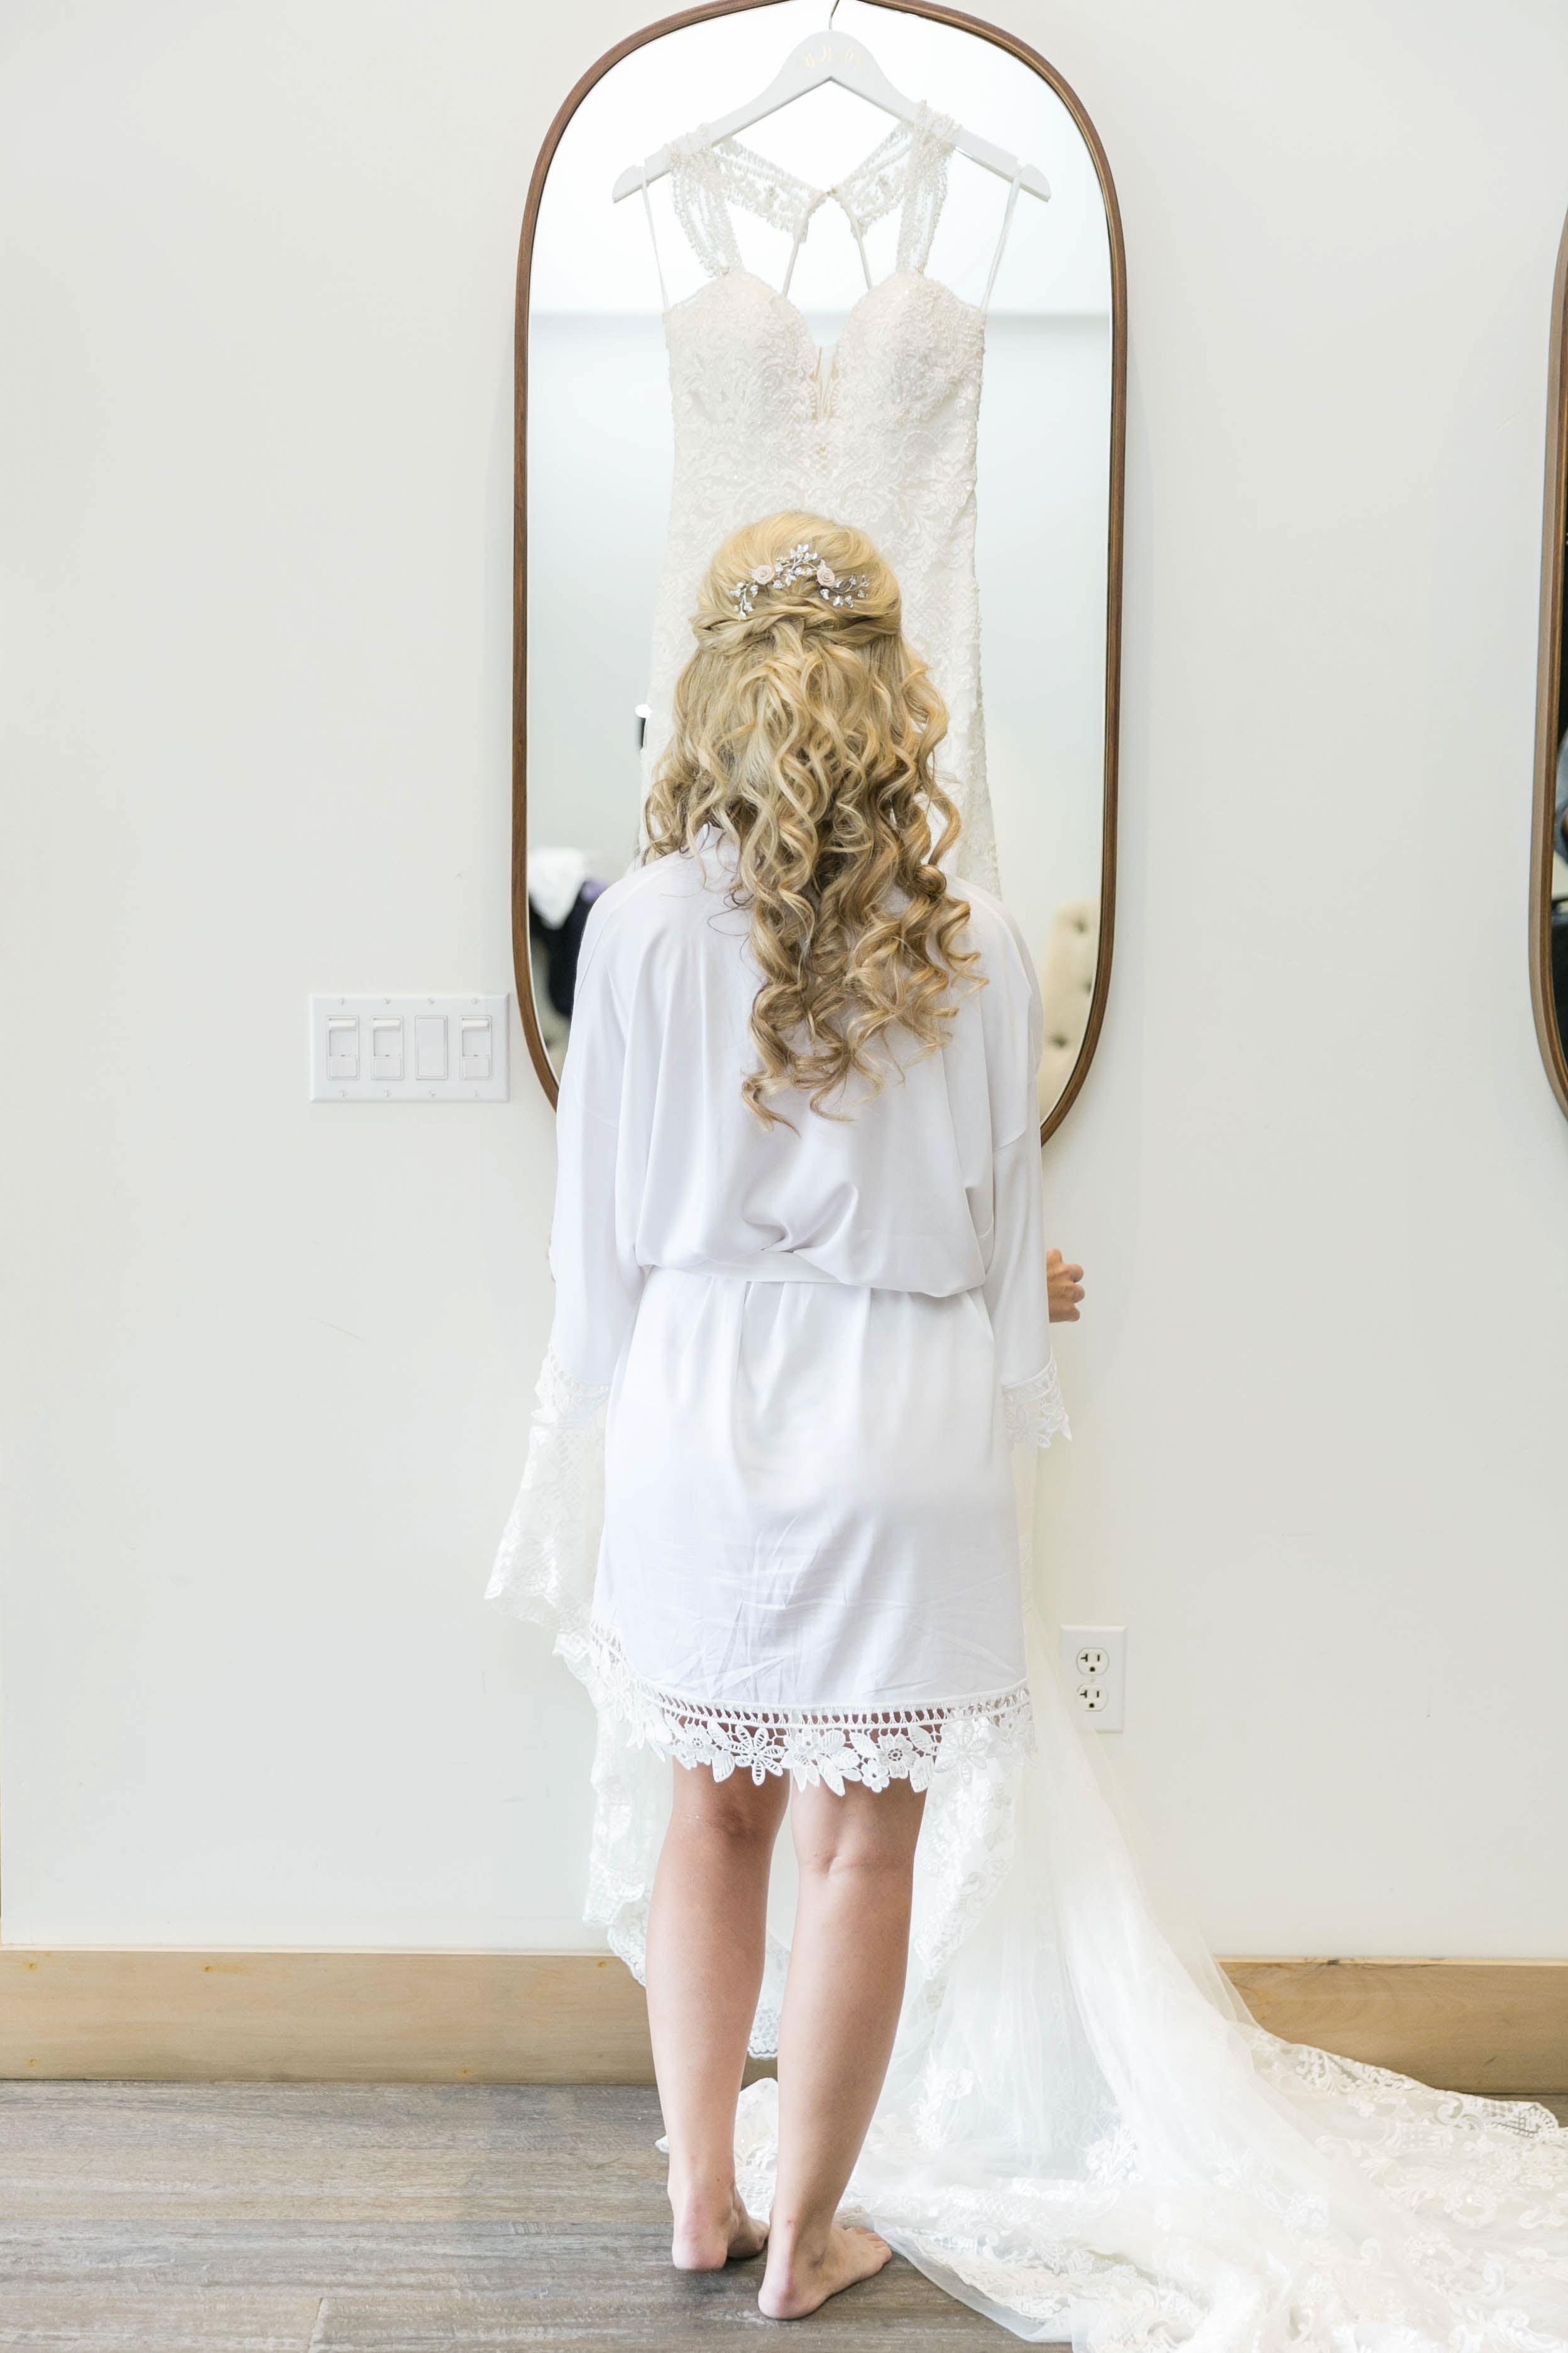 Domenica Beauty _ Hair and Makeup Artist _Wedding _ Temecula, CA Wedding _ Briana and Samuel _ 06.JPG